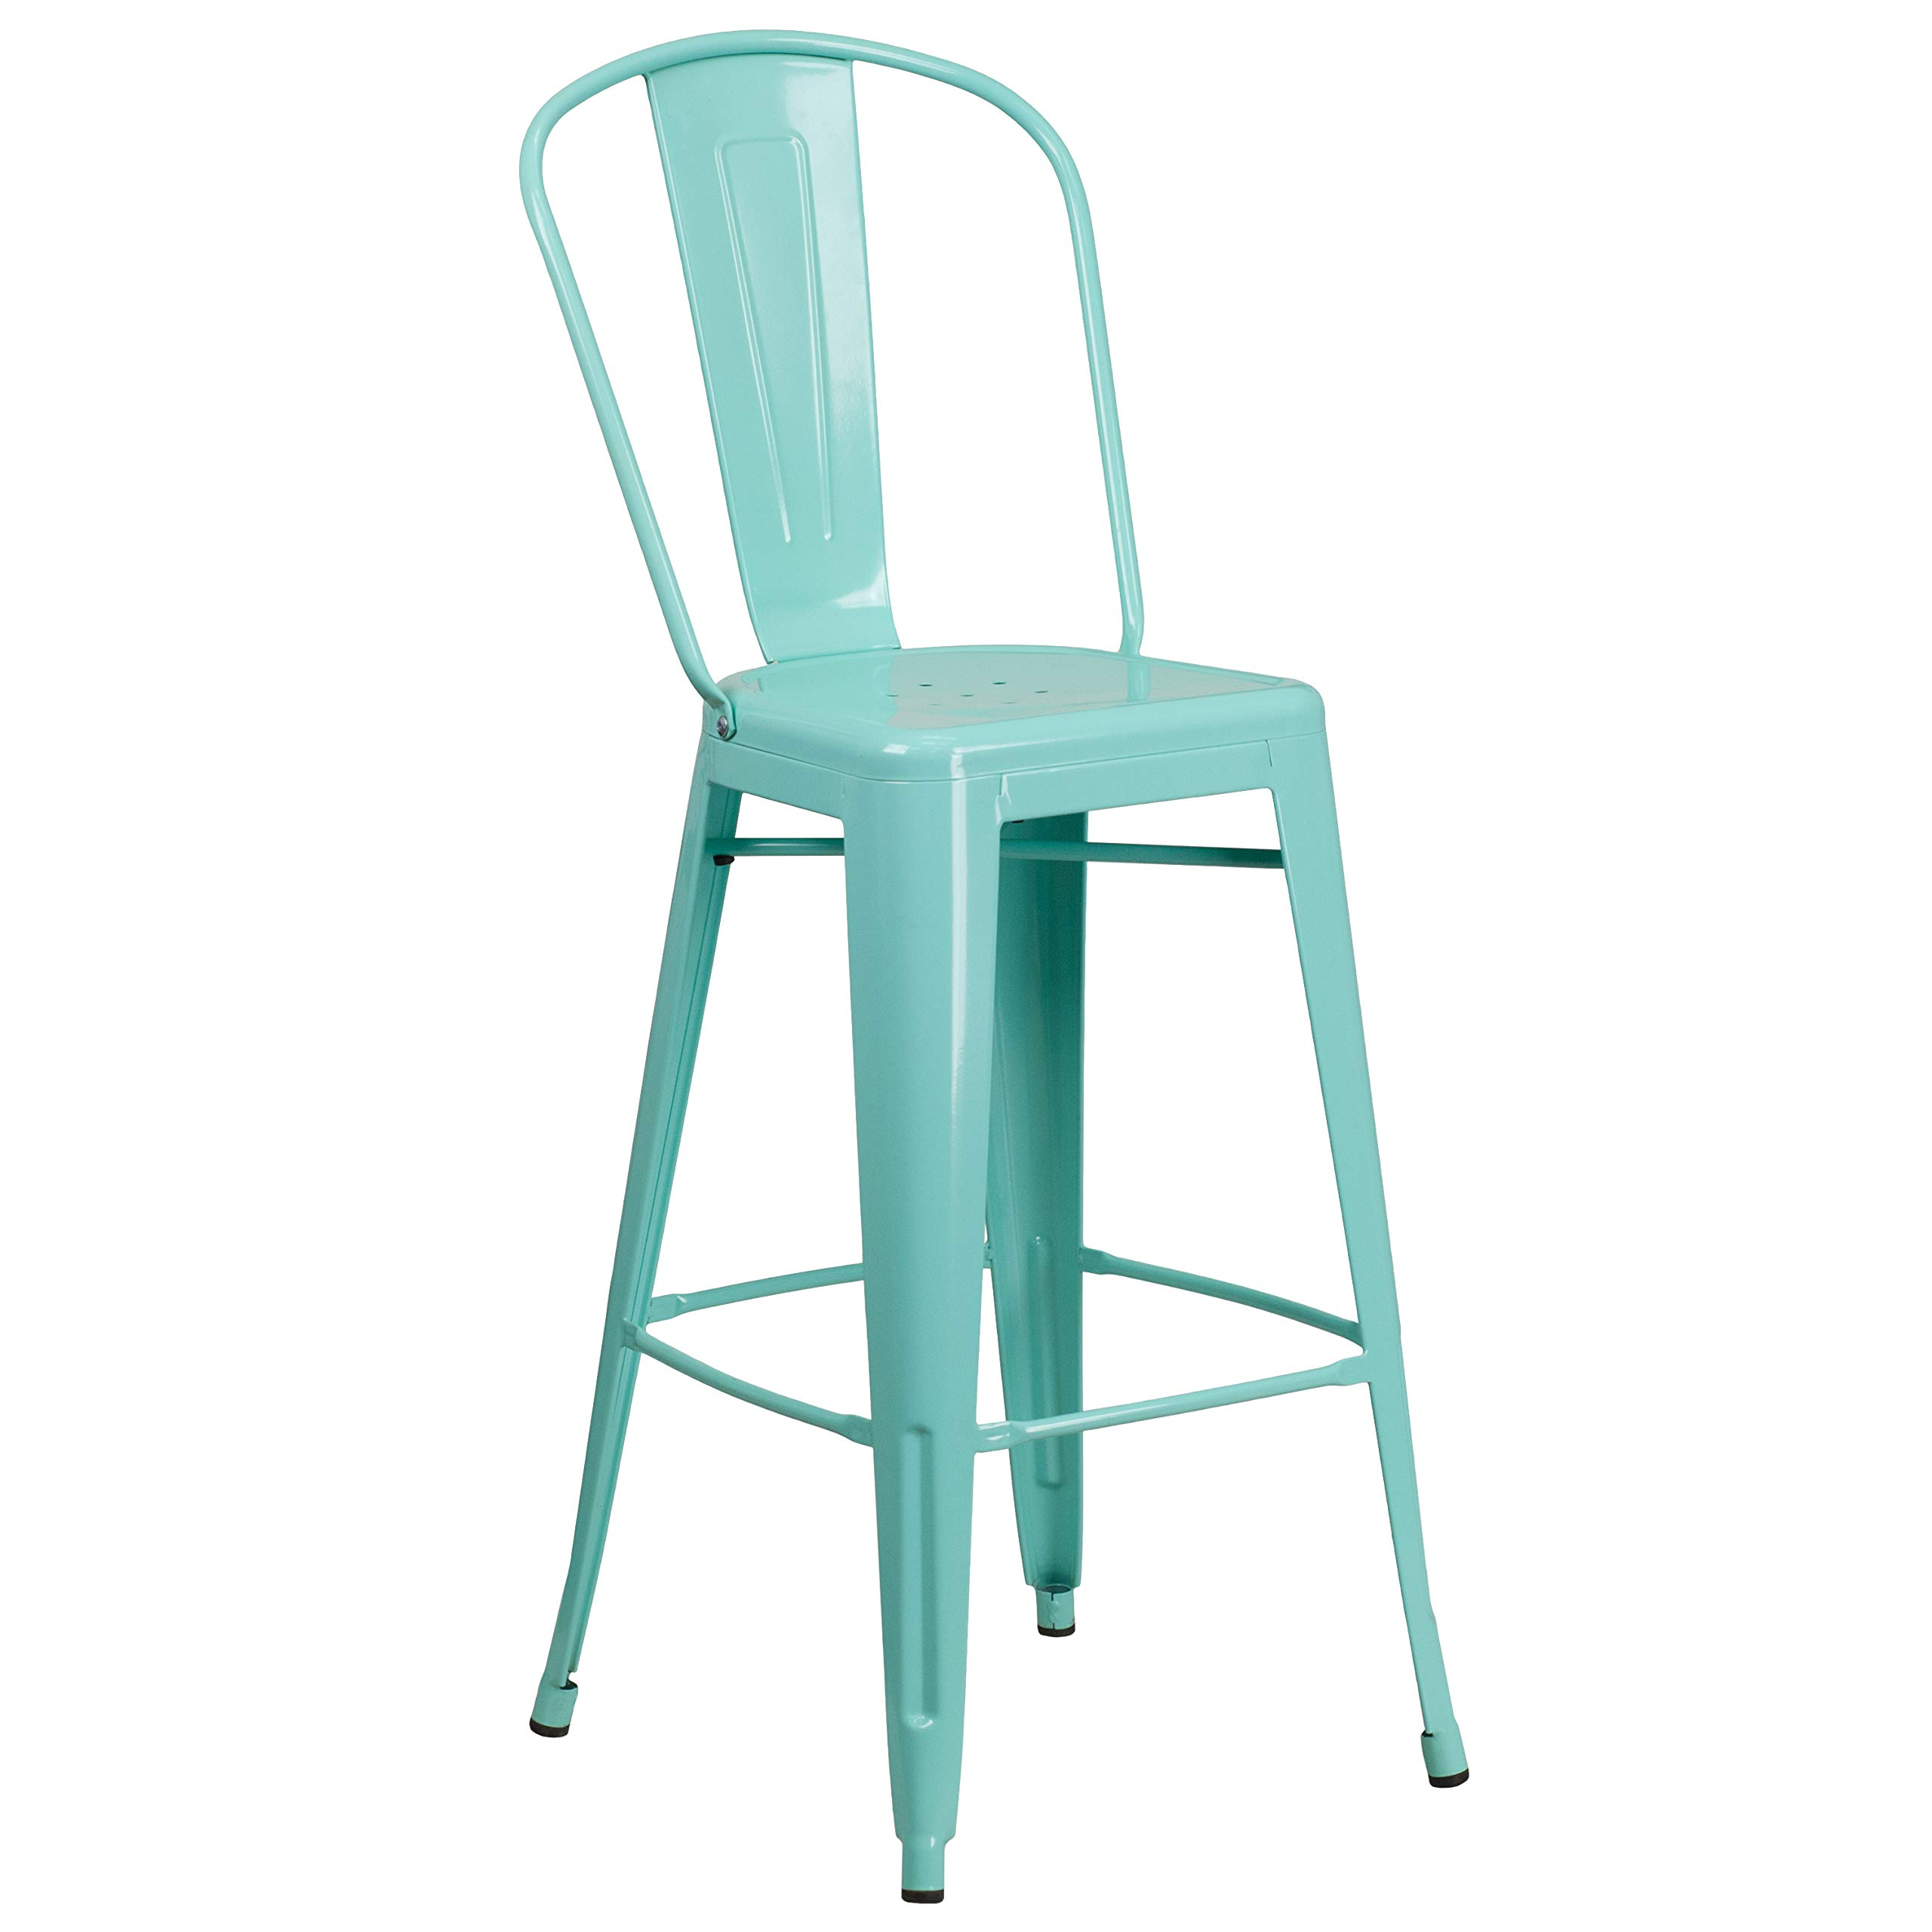 Amazon.com: Flash Furniture 30\'\' High Mint Green Metal Indoor ...